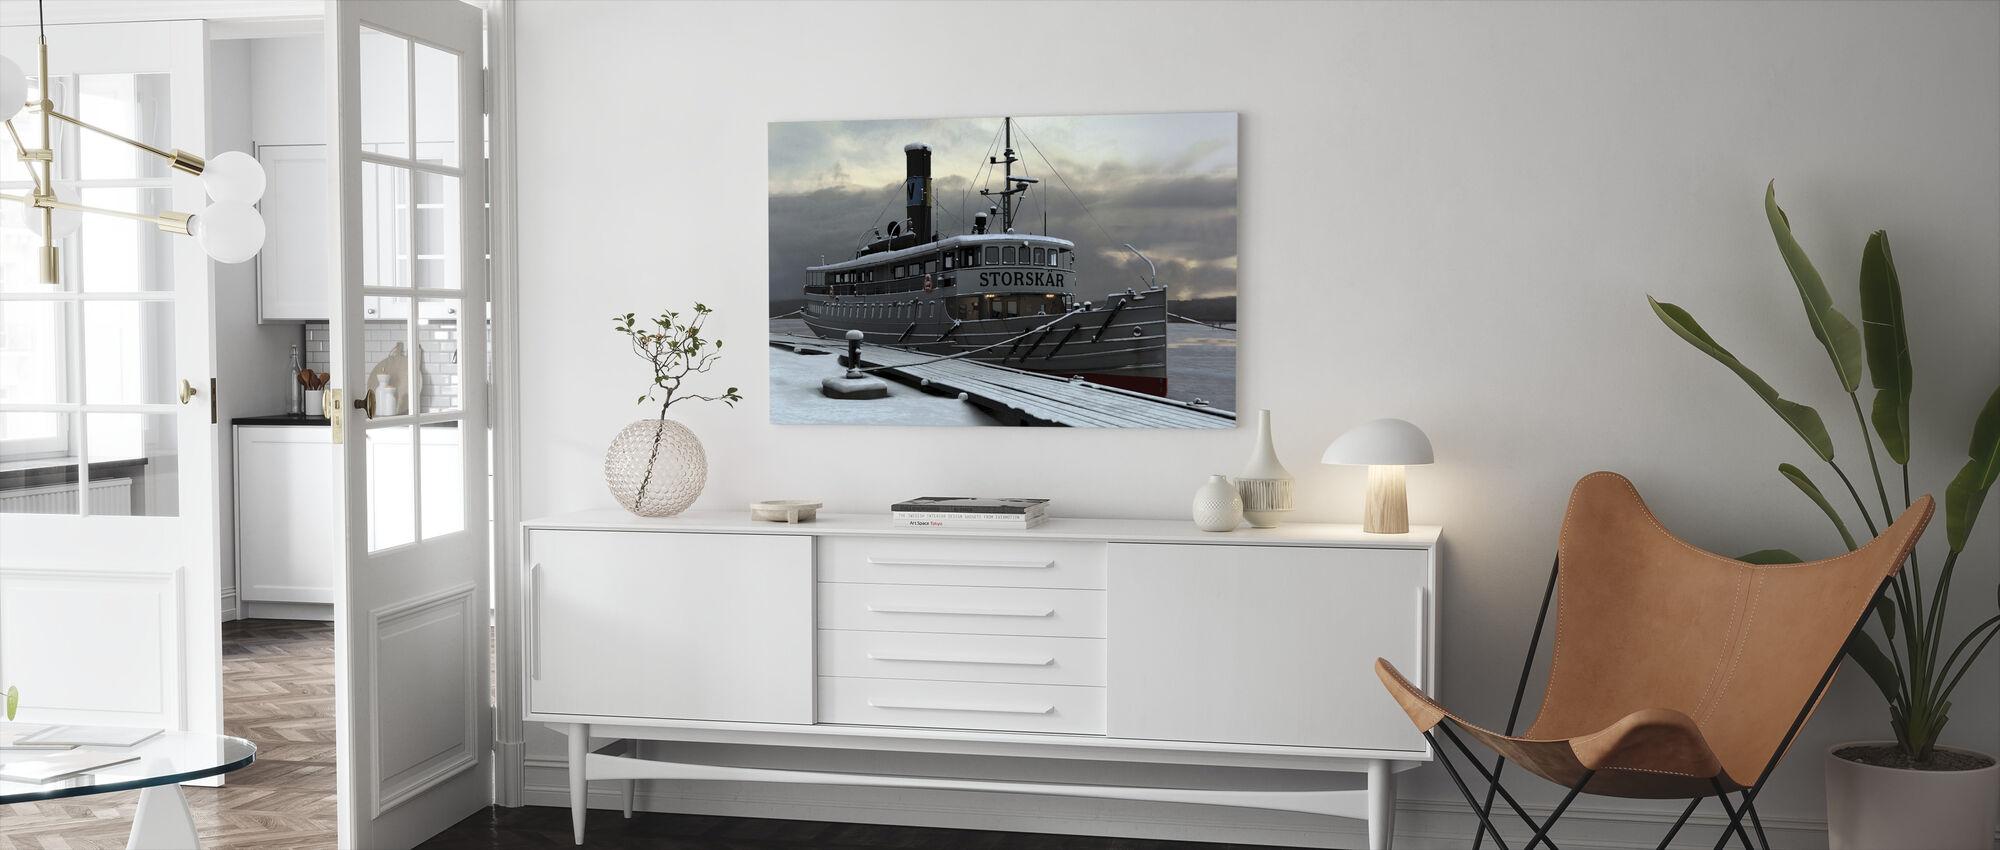 Waxholm Boat - Canvas print - Living Room